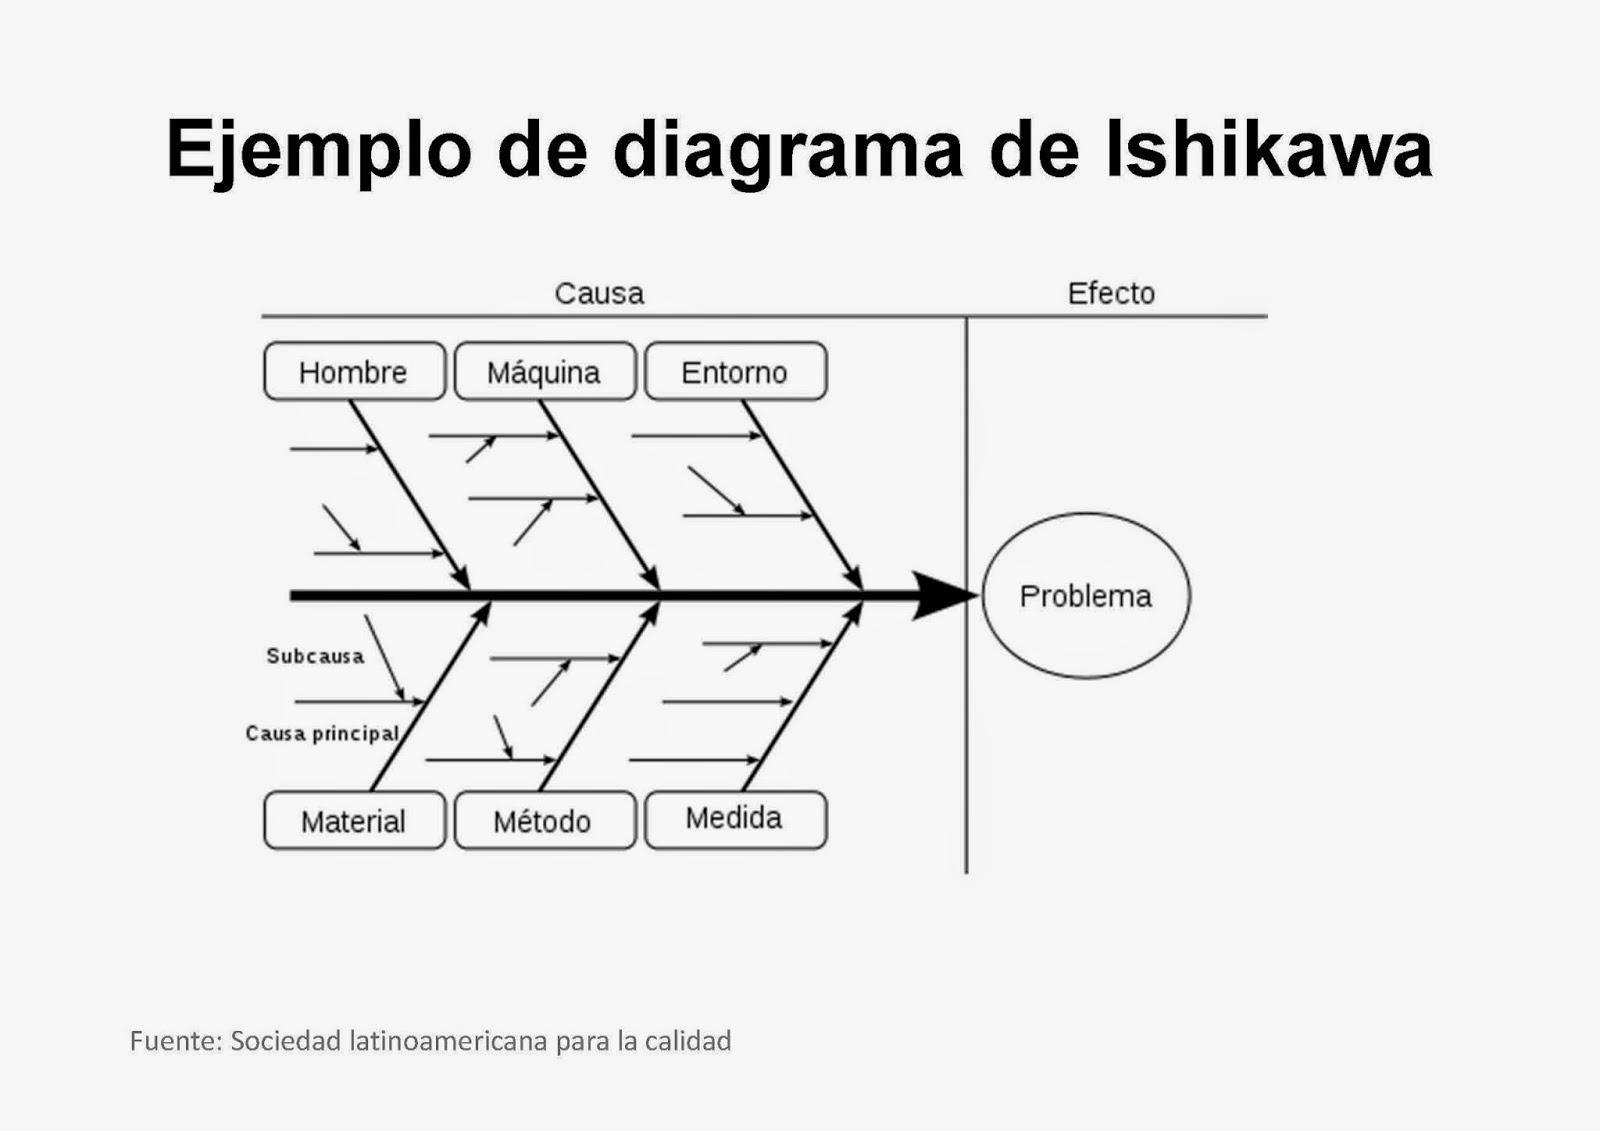 5ms diagrama de pesca do pictures to pin on pinterest